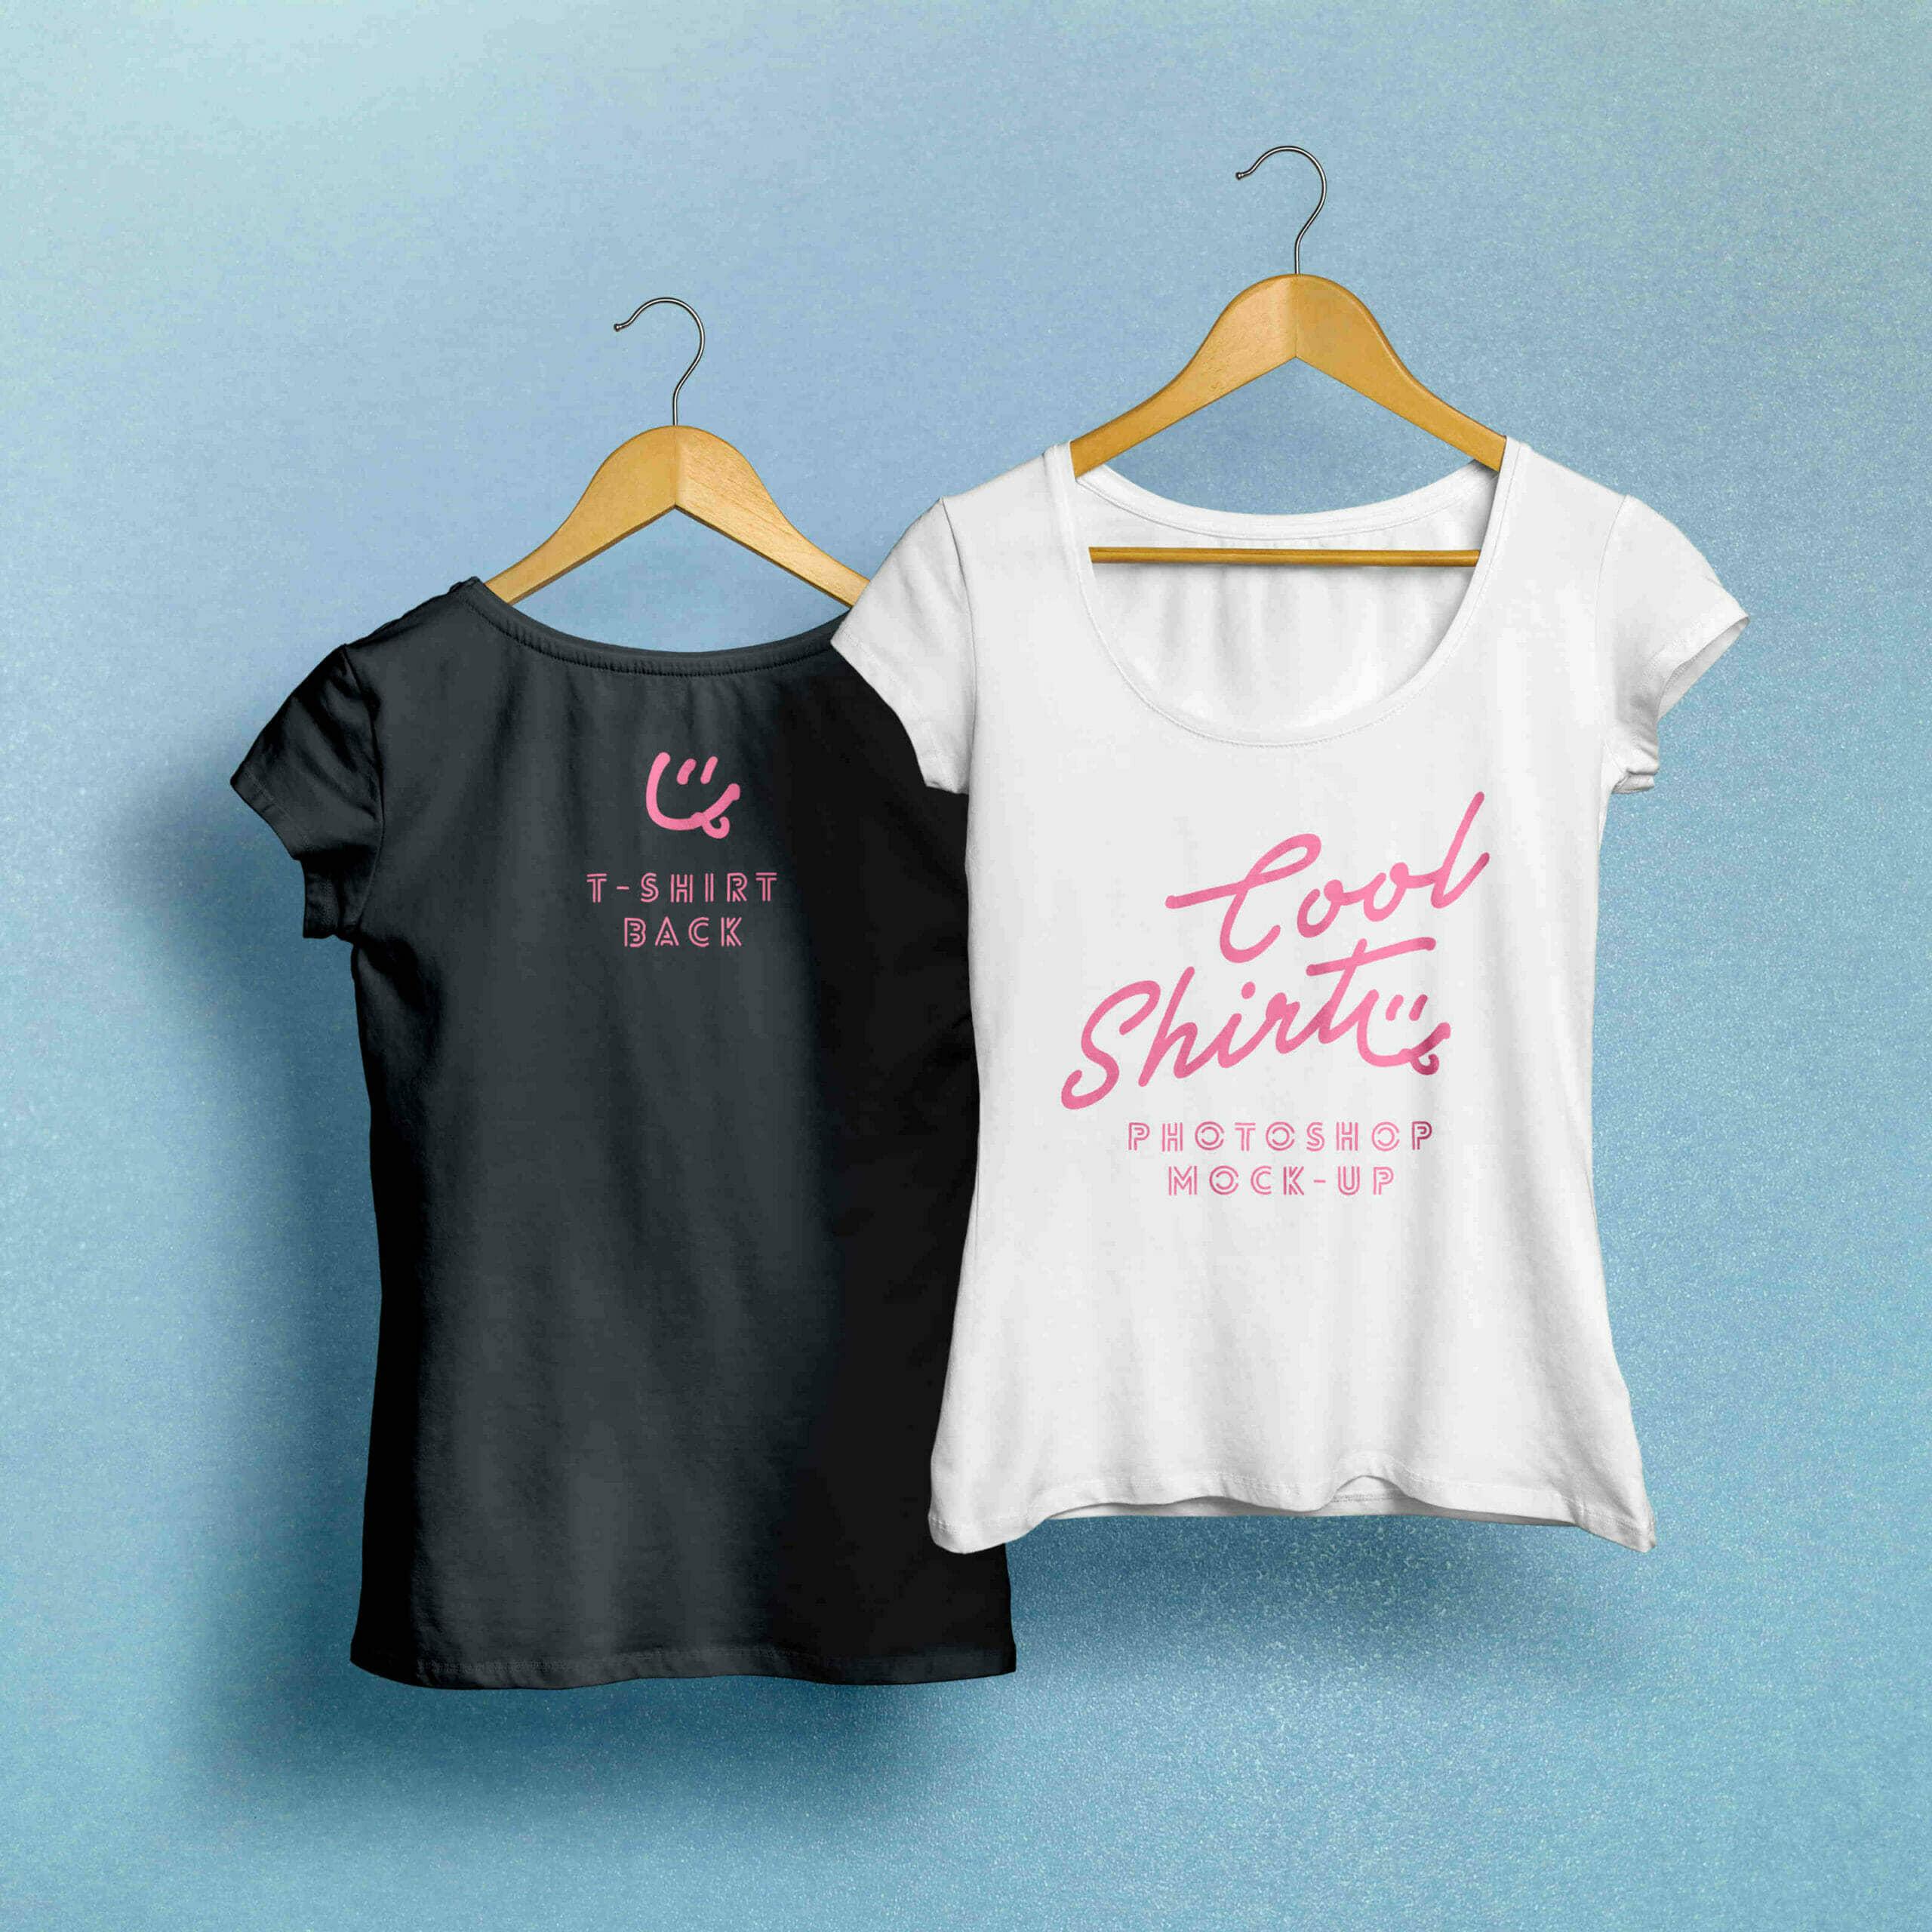 Black & White Woman T-Shirt Mockup